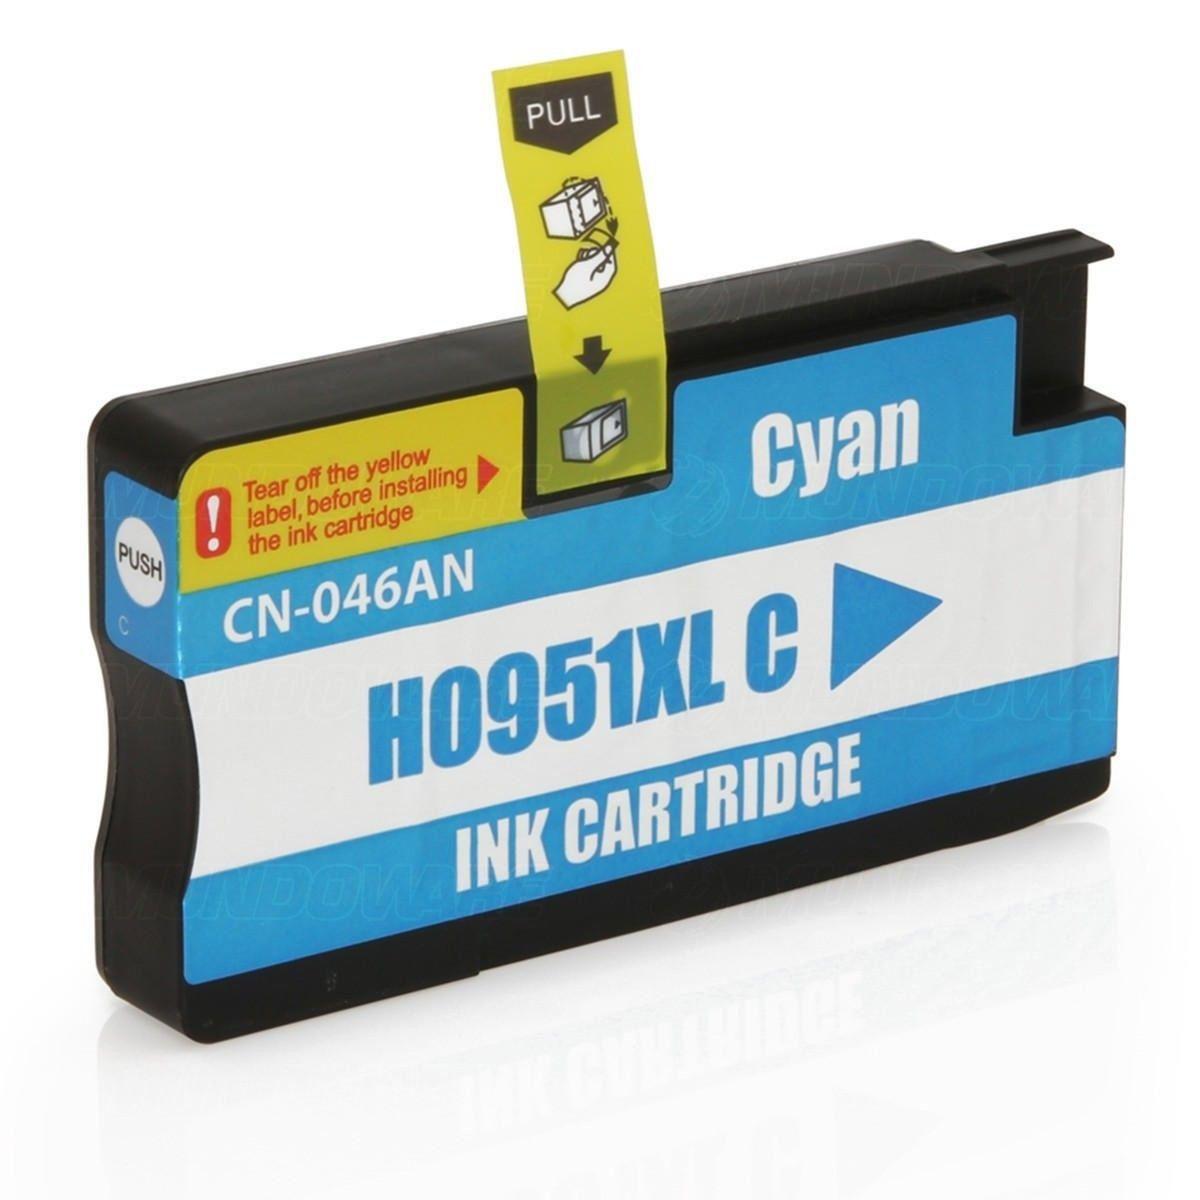 Compatível: Cartucho de Tinta 951xl 951 para HP Pro 8600w 8620 8610 8100 8600 251dw N811d N911g / Ciano / 27ml